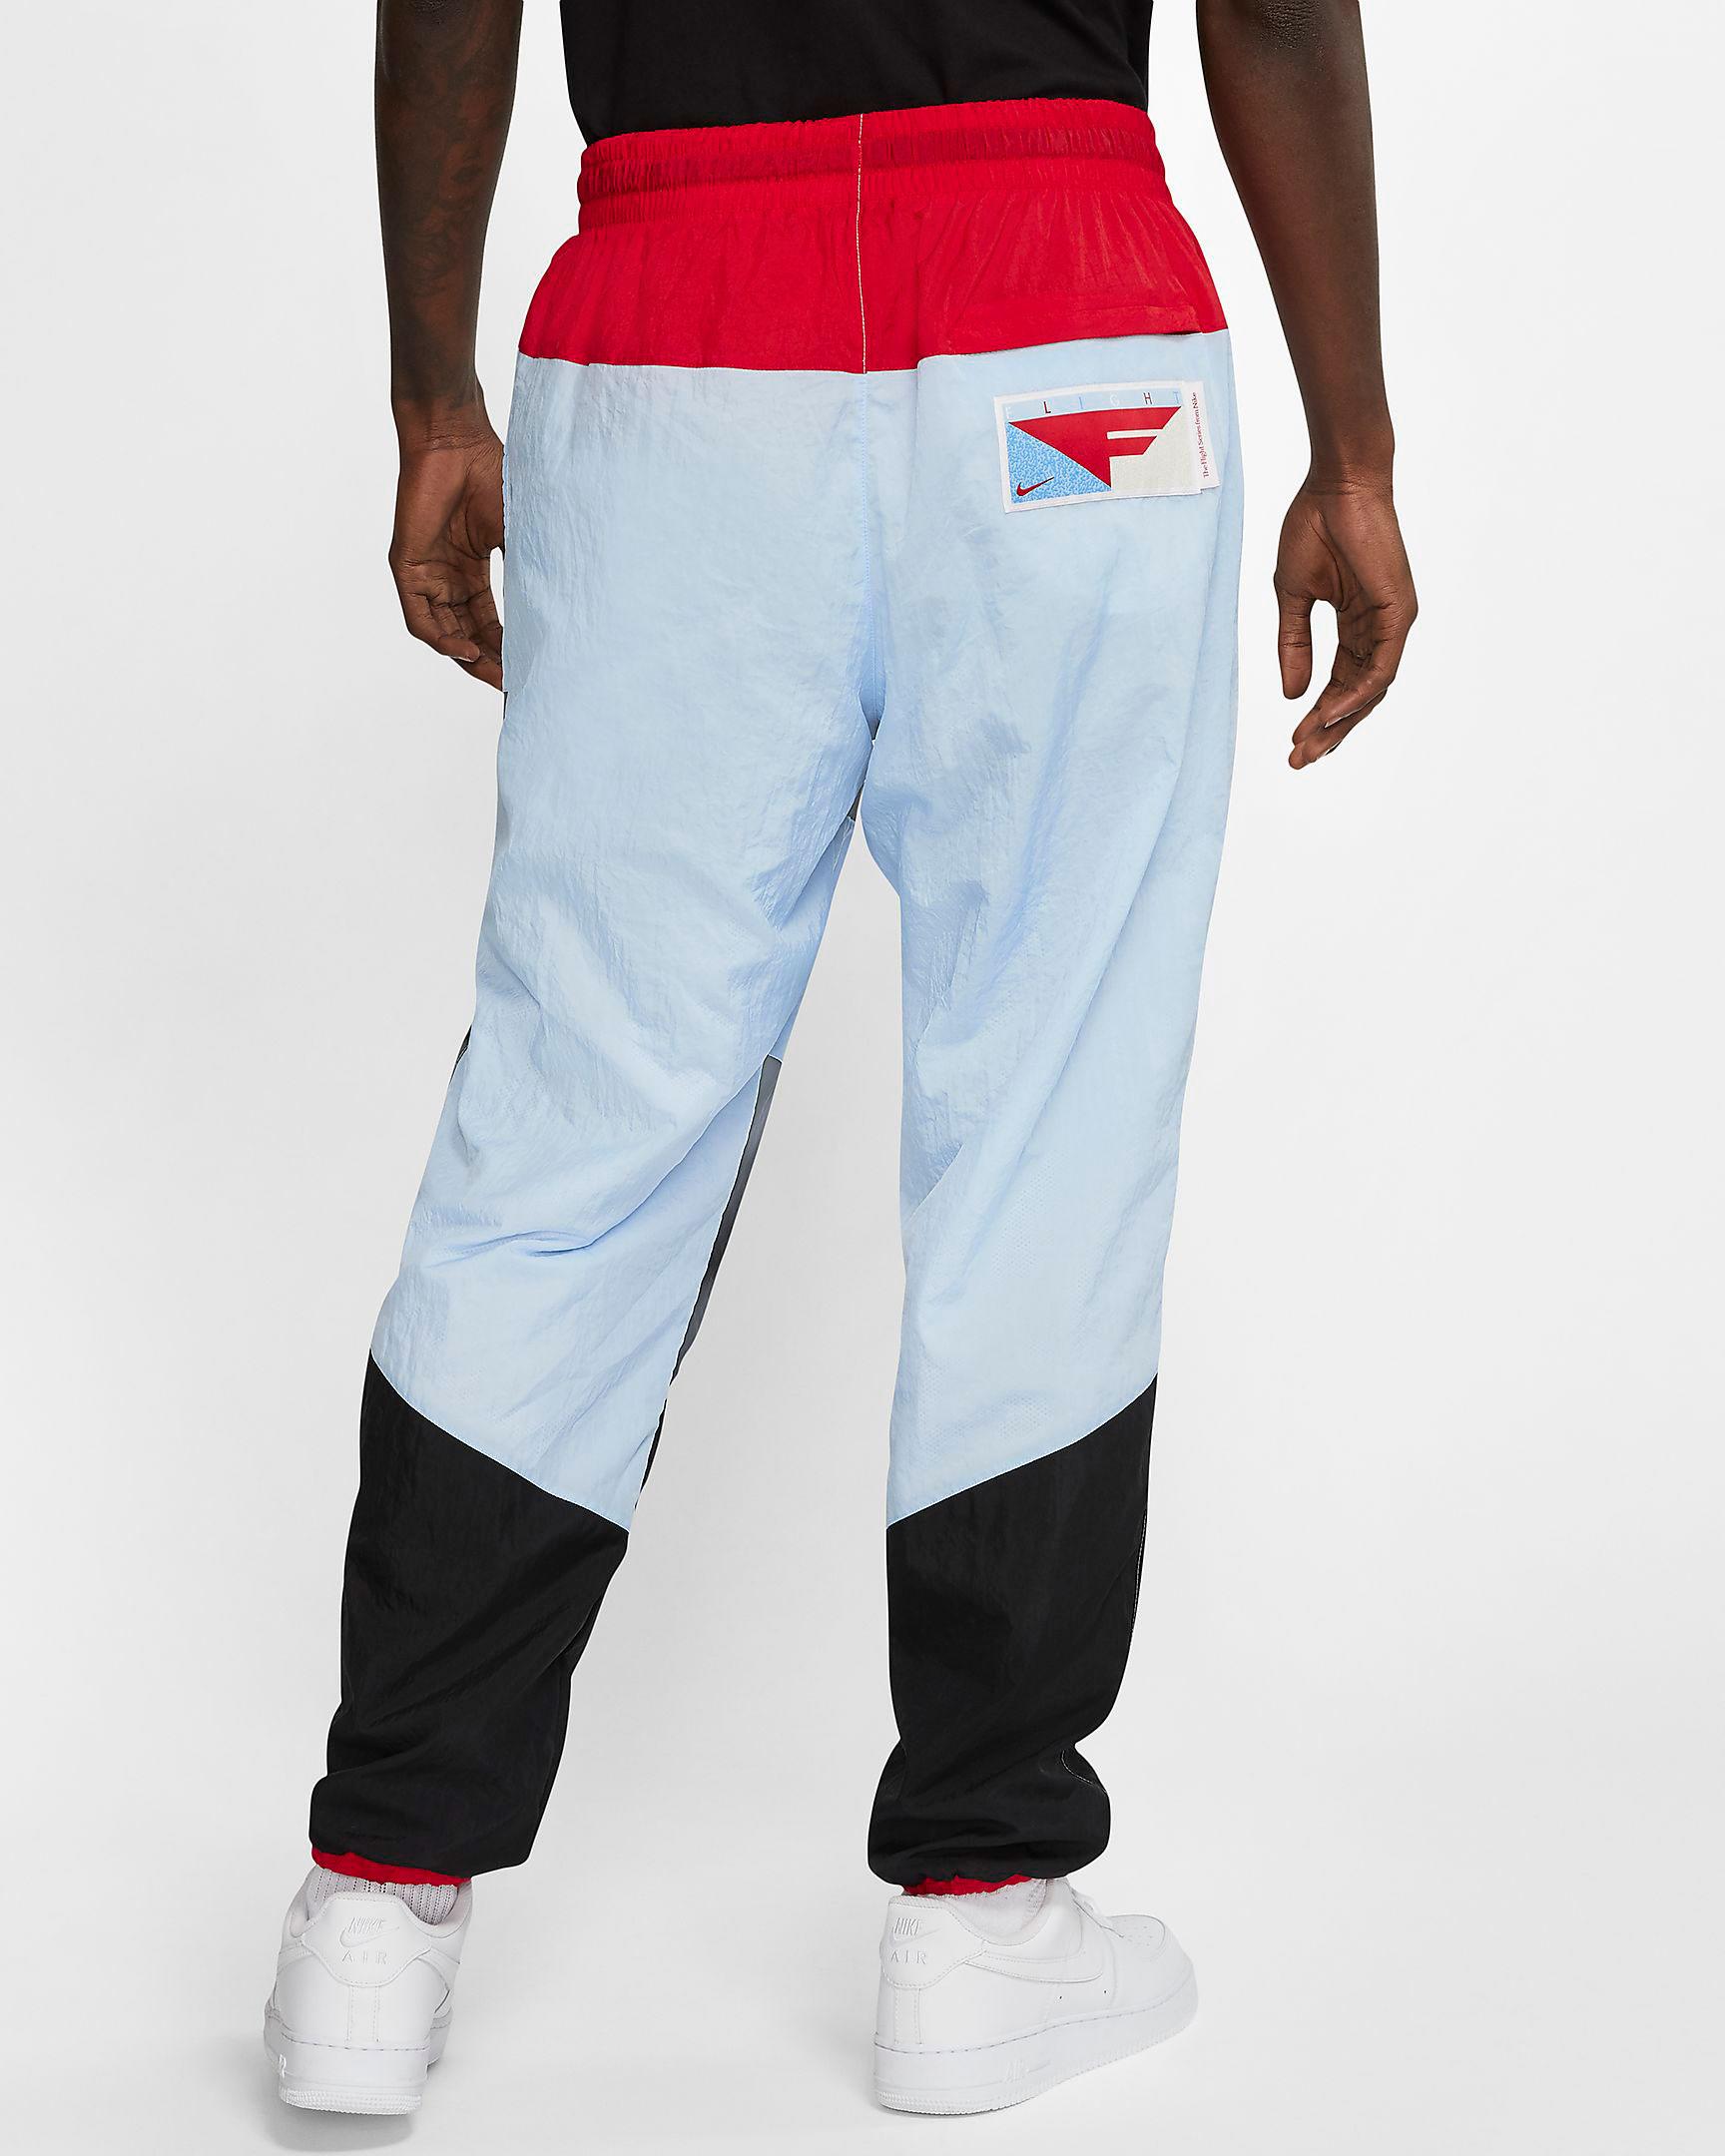 nike-flight-chicago-pants-1